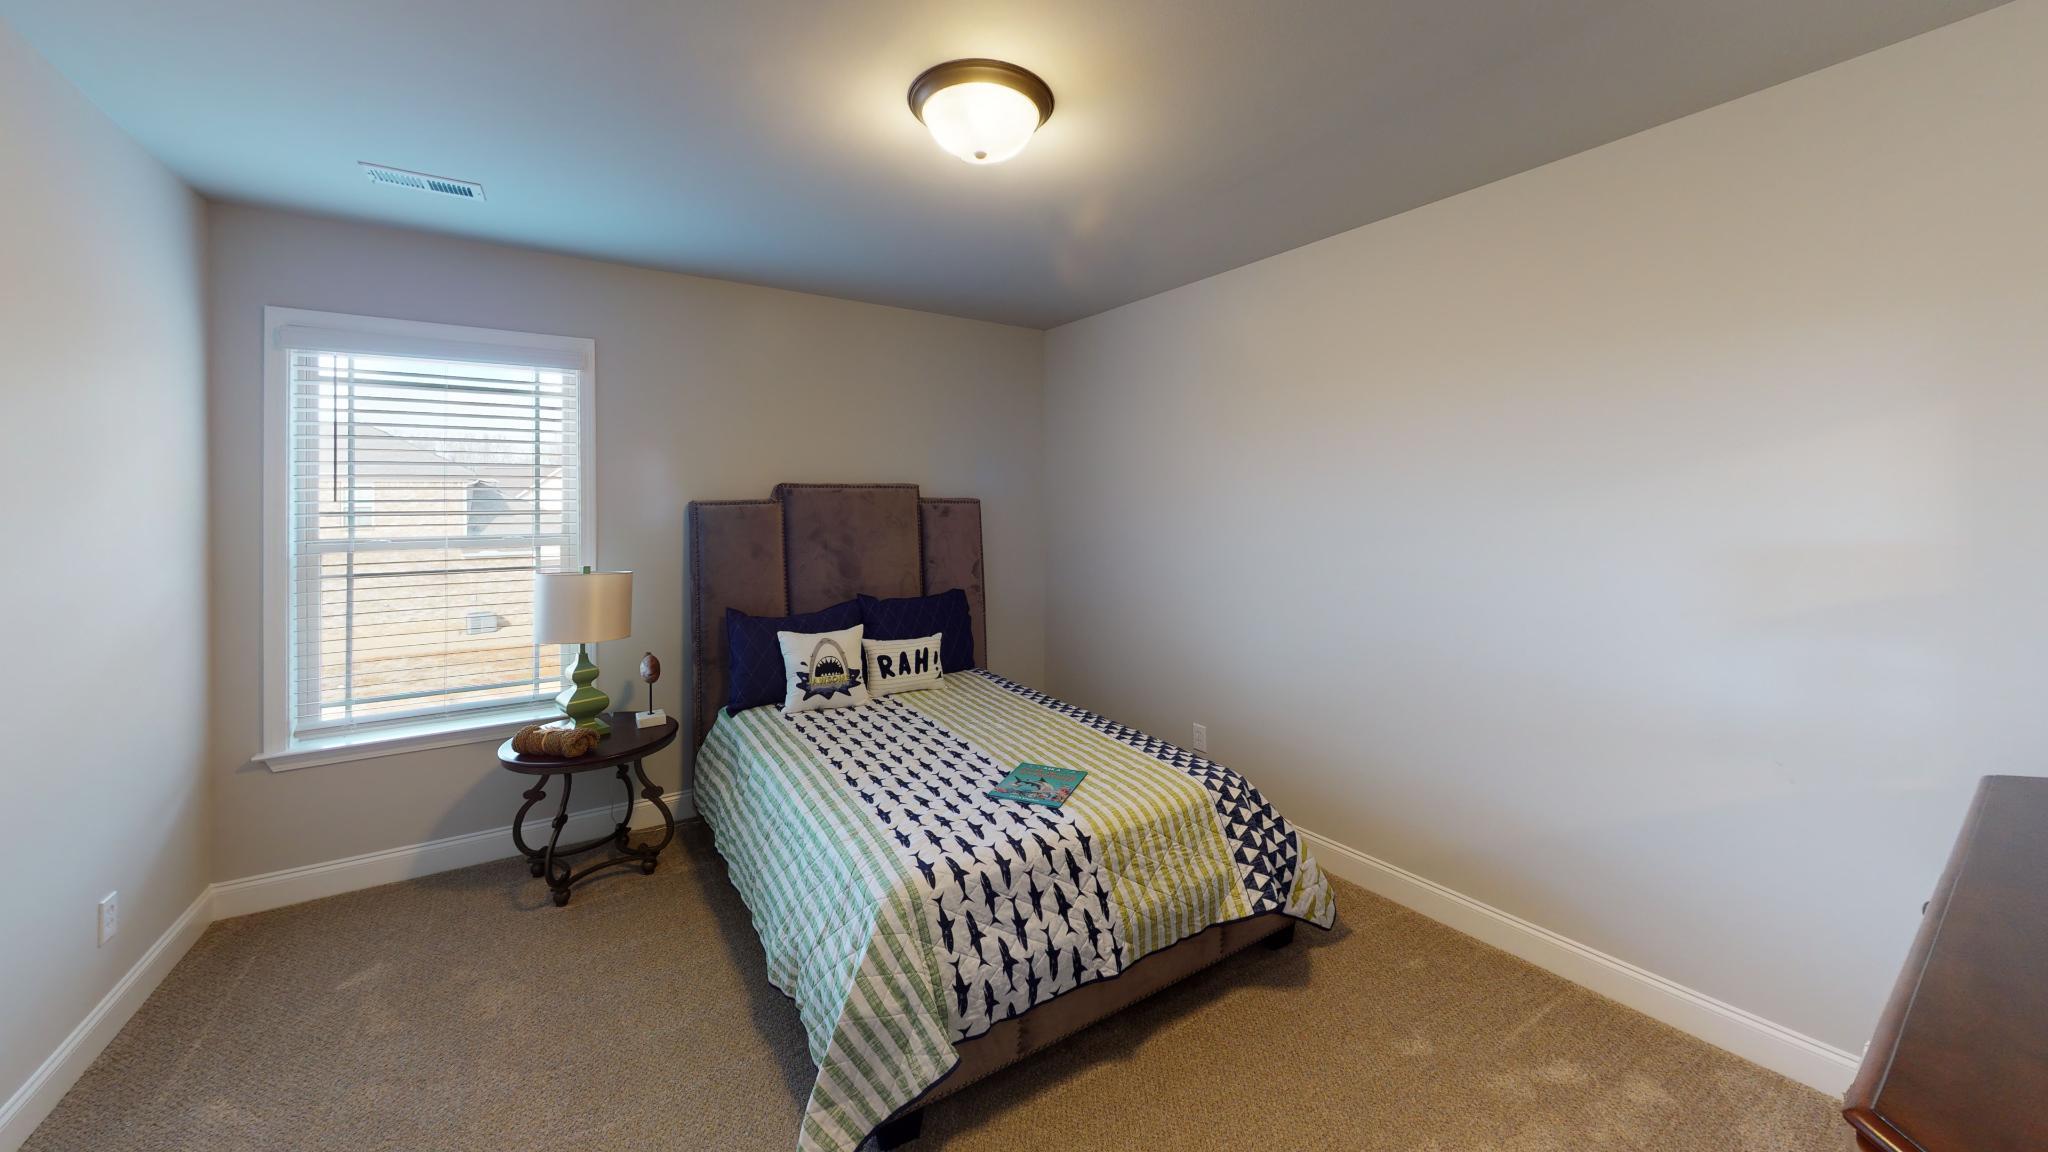 Bedroom featured in the 3018 Premier By Hyde Homes in Huntsville, AL